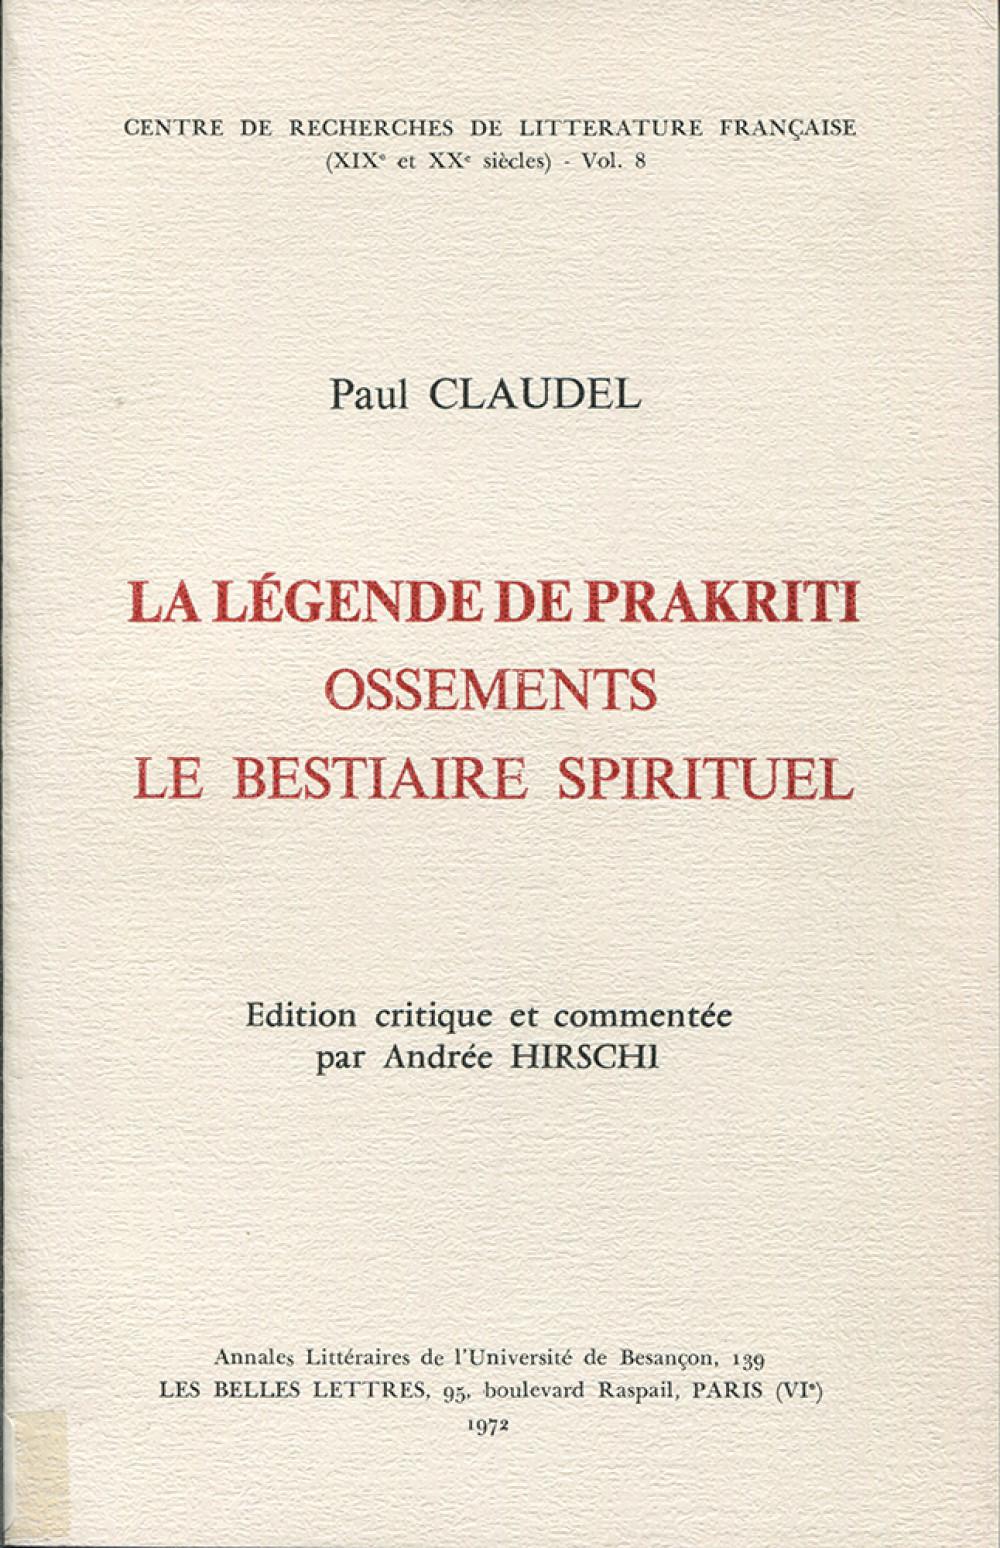 Paul Claudel : La légende de Prakriti. Ossements. Le bestiaire spirituel